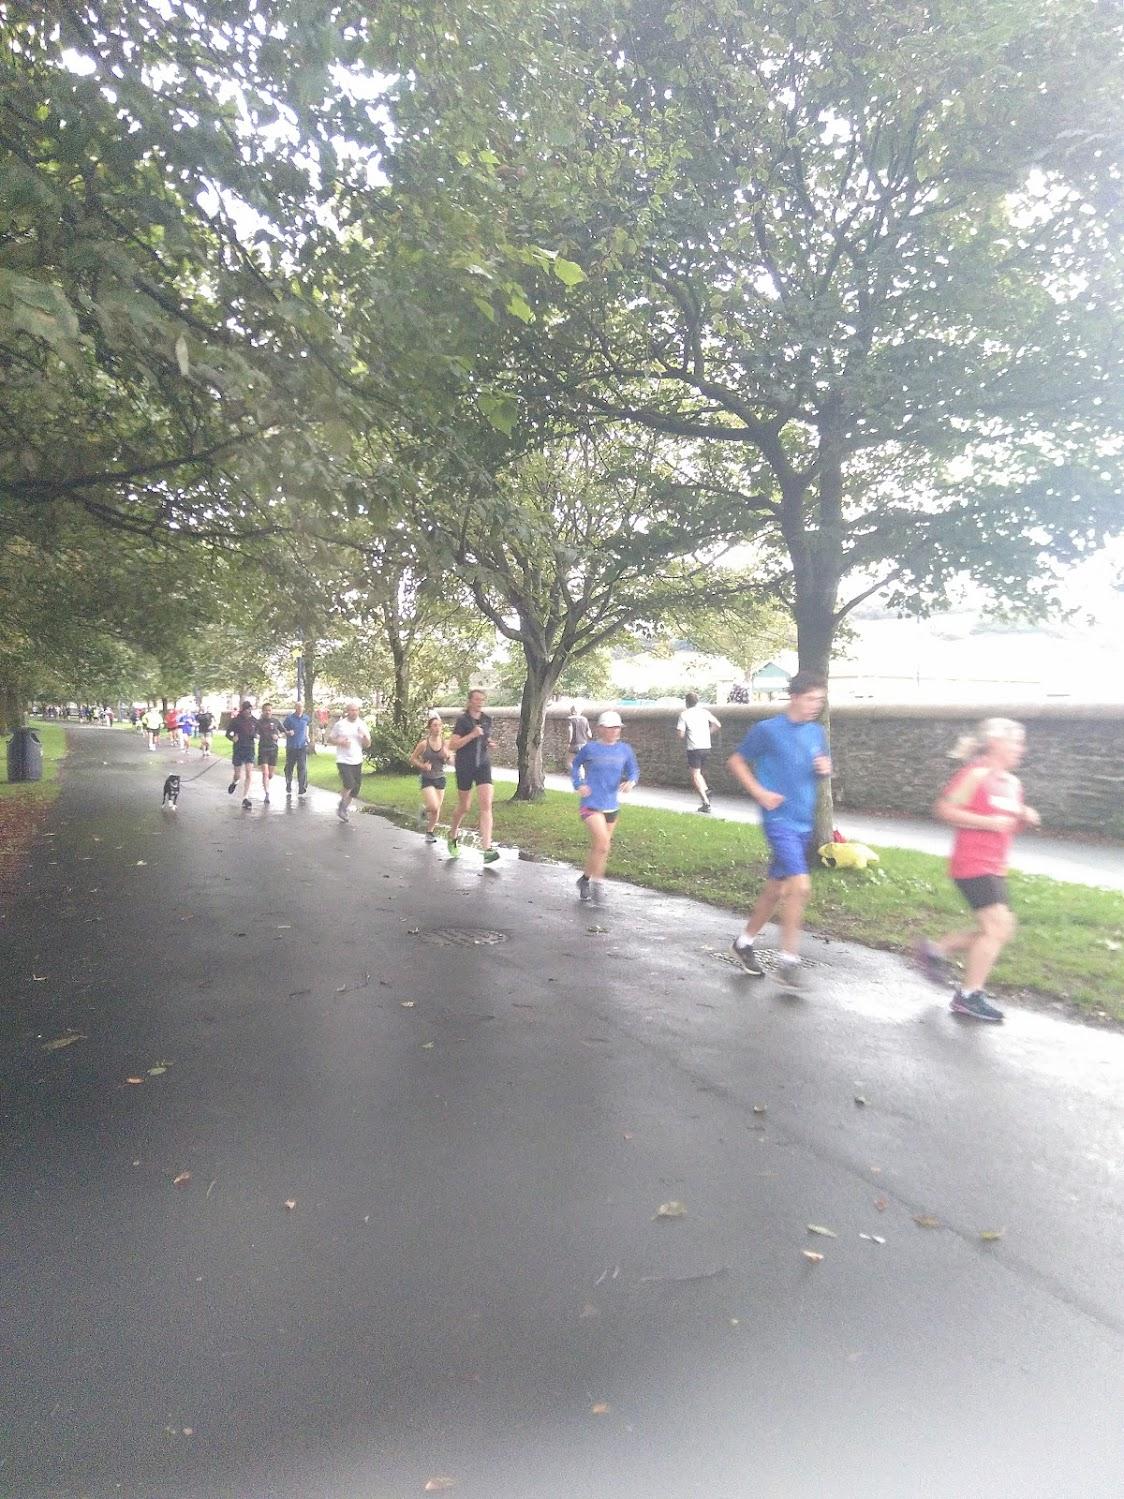 Some runners near the start